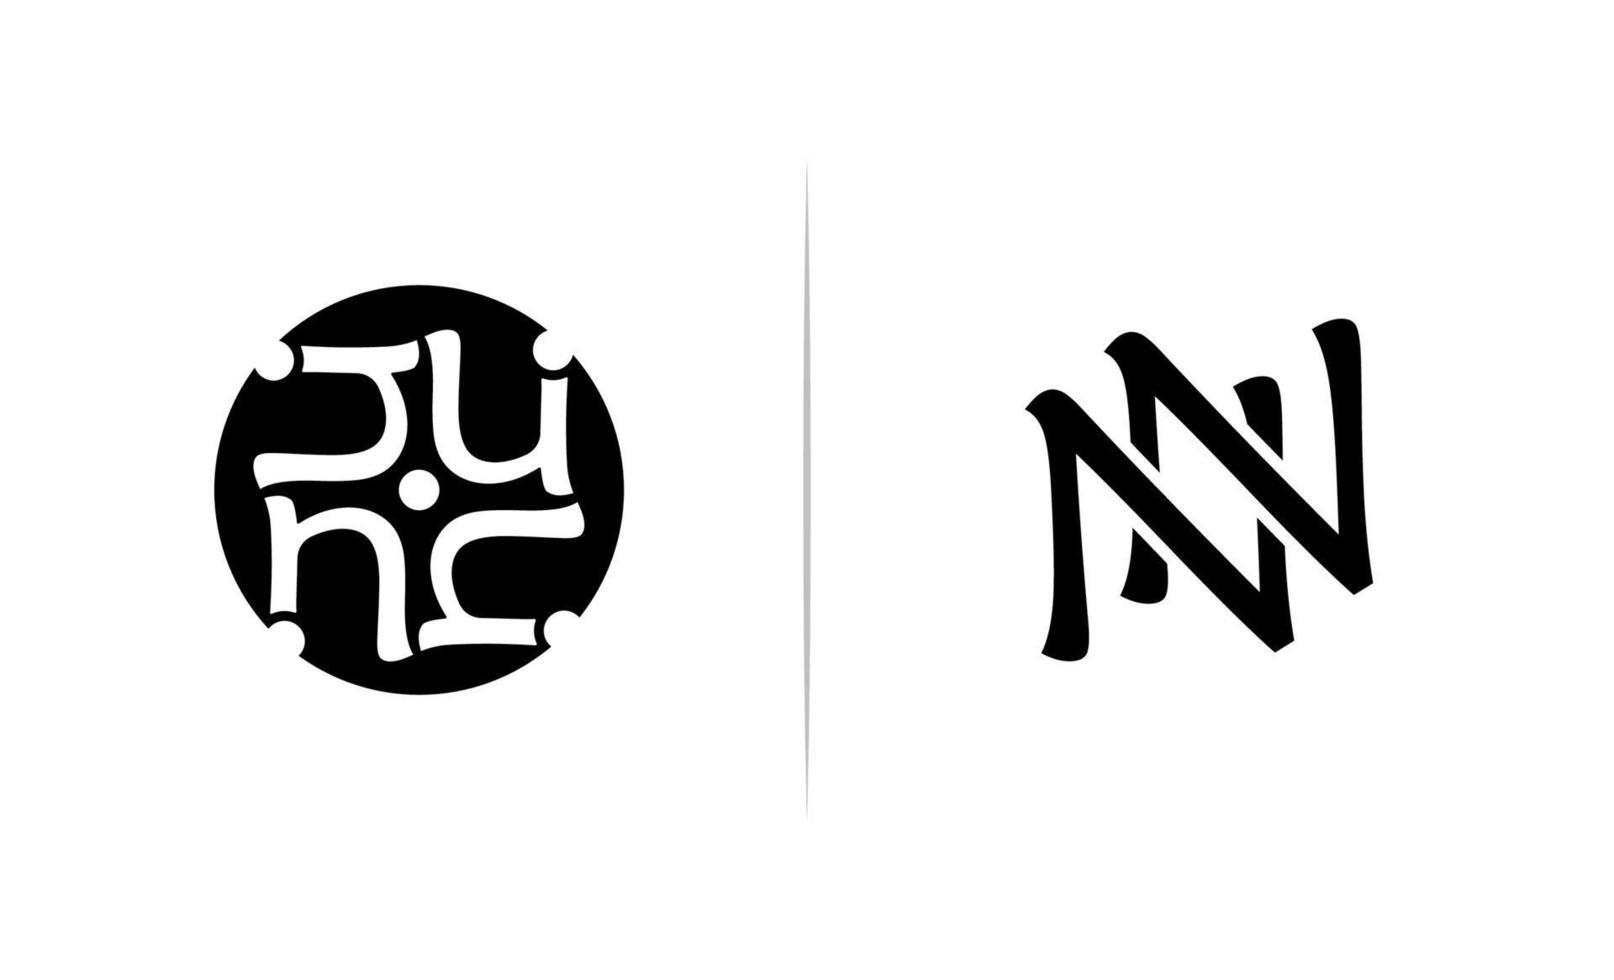 initial nn, n logo mall design vektor